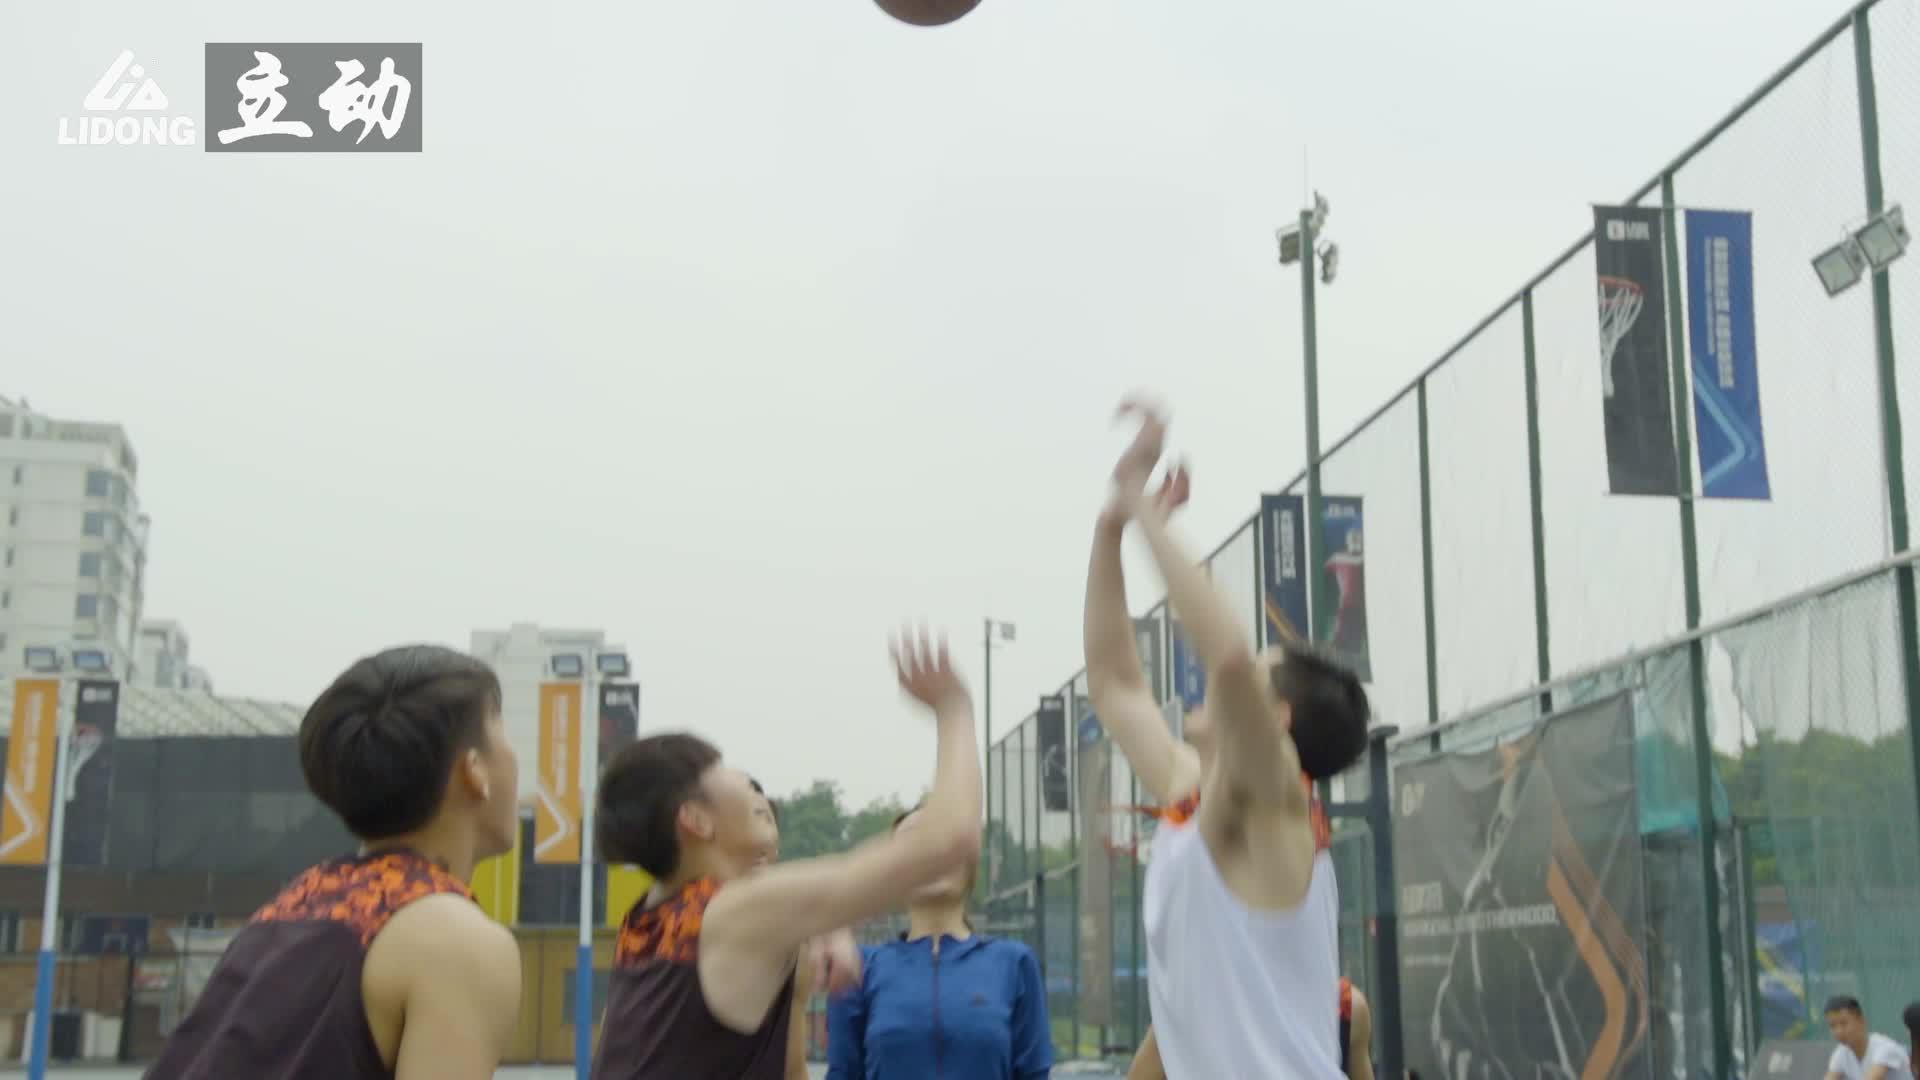 Basketball-Team-Trainingsanzüge passen den besten College-Basketball-Jersey-Design in Blau an